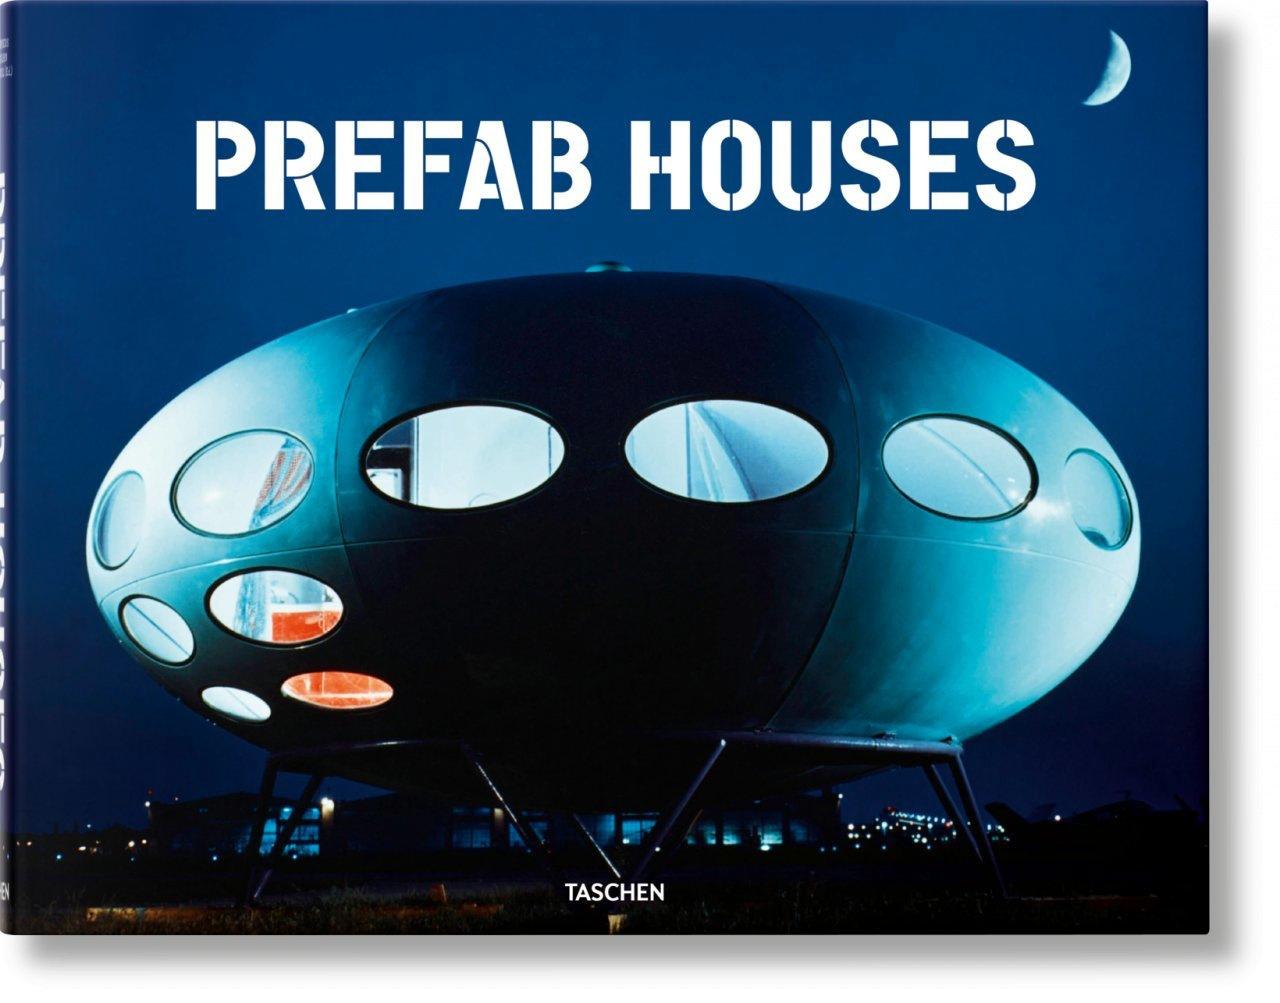 VA-PREFAB HOUSES-TRILINGUE